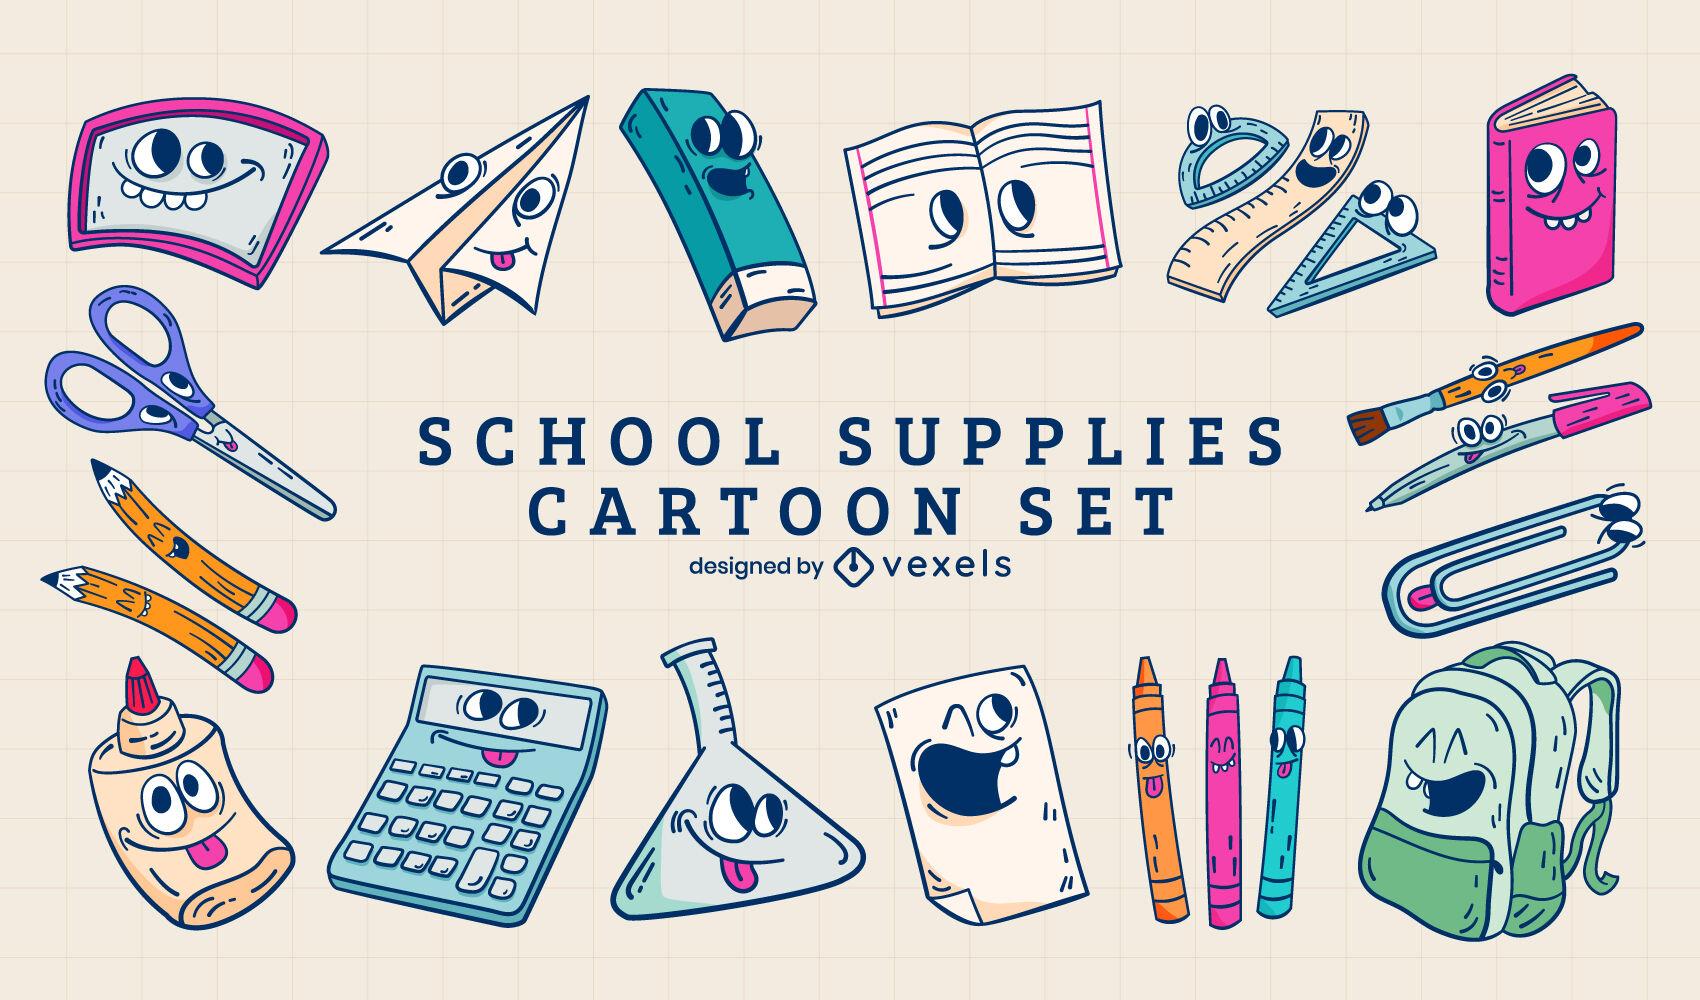 Conjunto de dibujos animados de útiles escolares